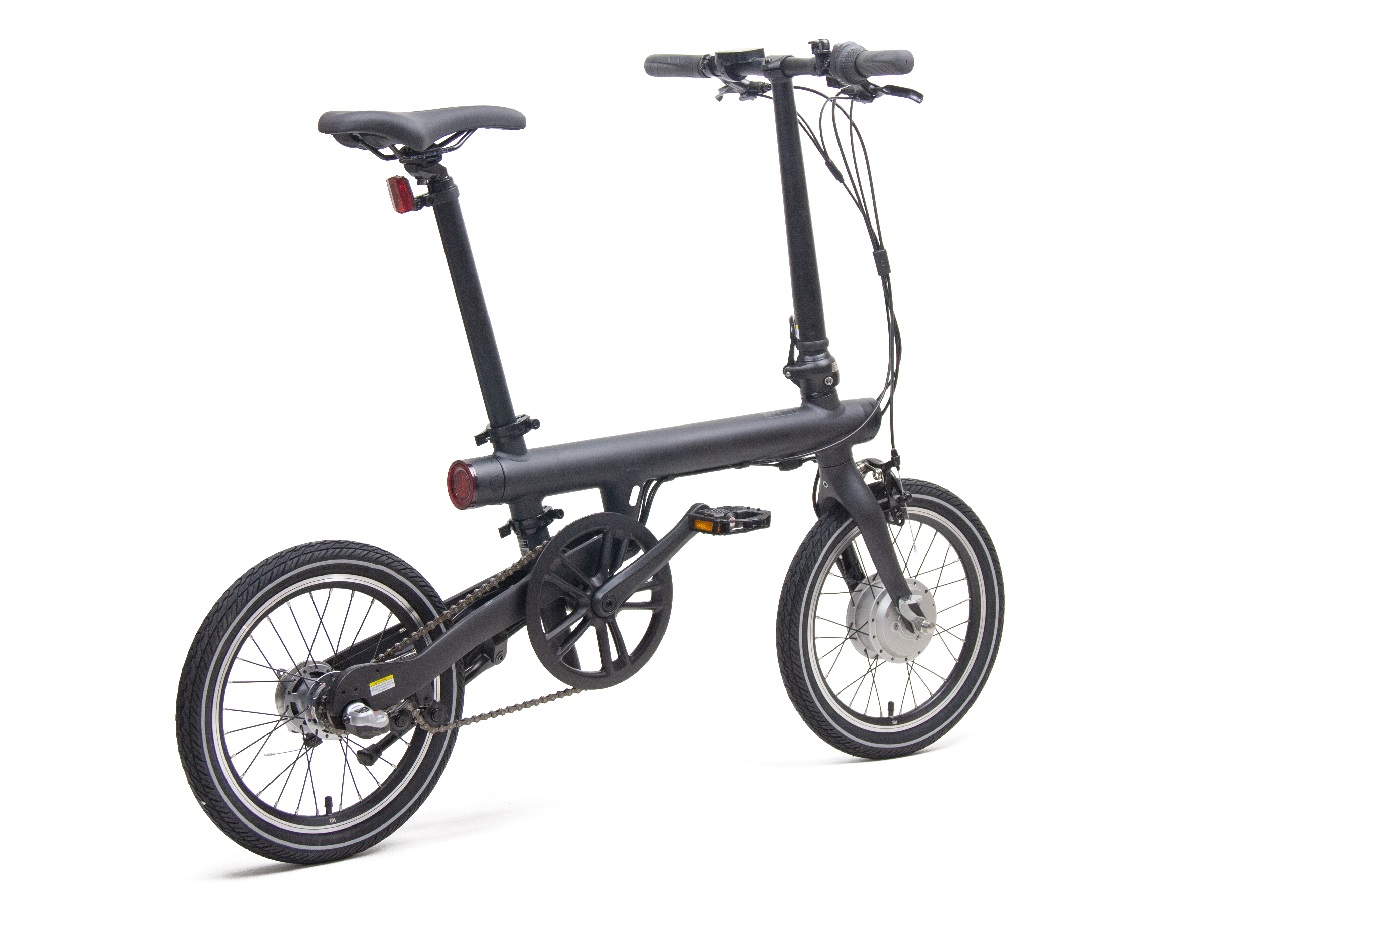 Mi Smart Folding Bike